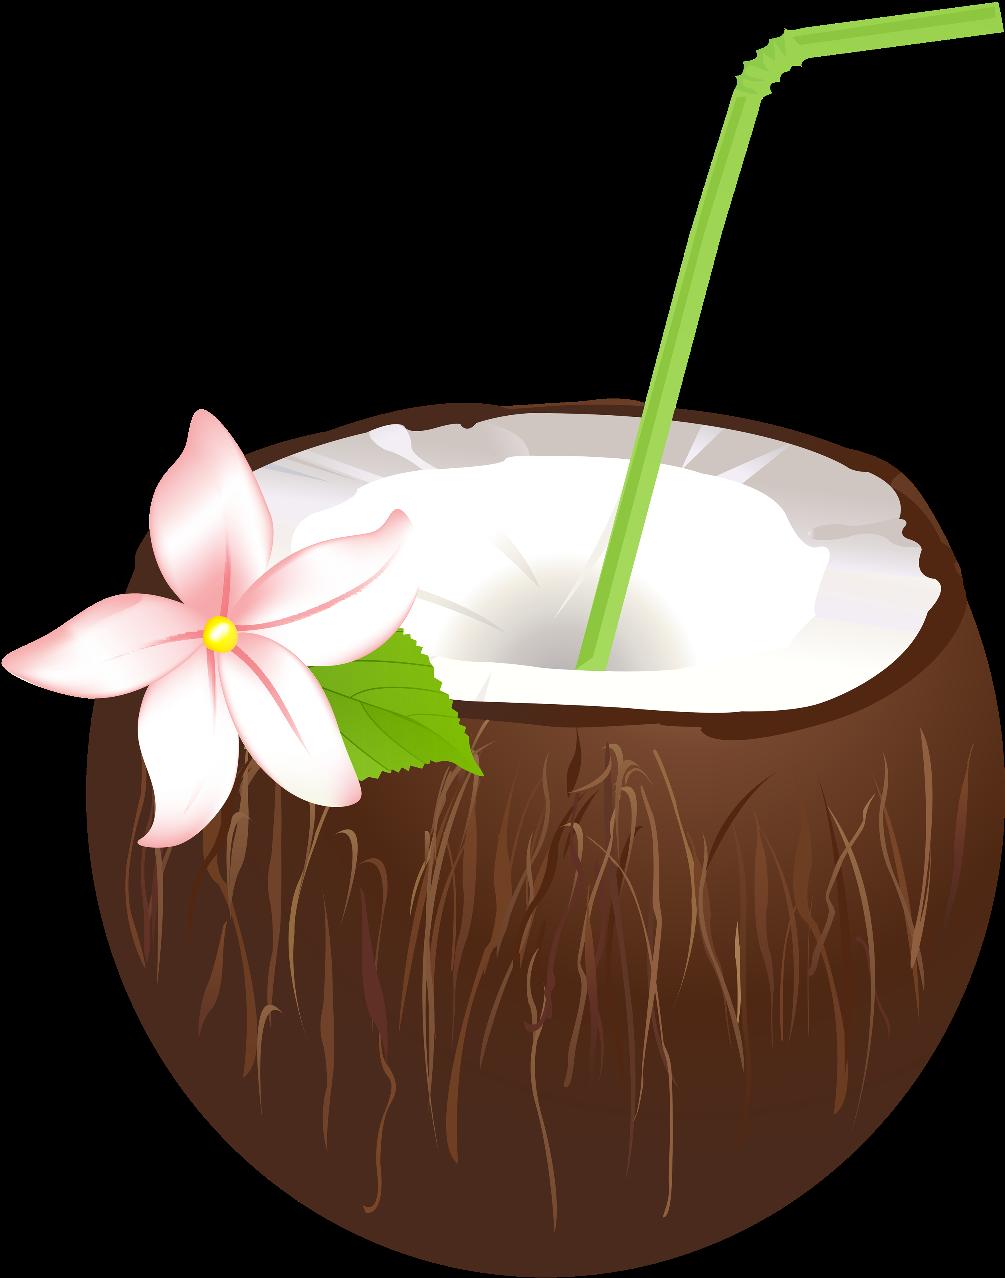 Drink drinks cocktails flower. Coconut clipart gold cocktail